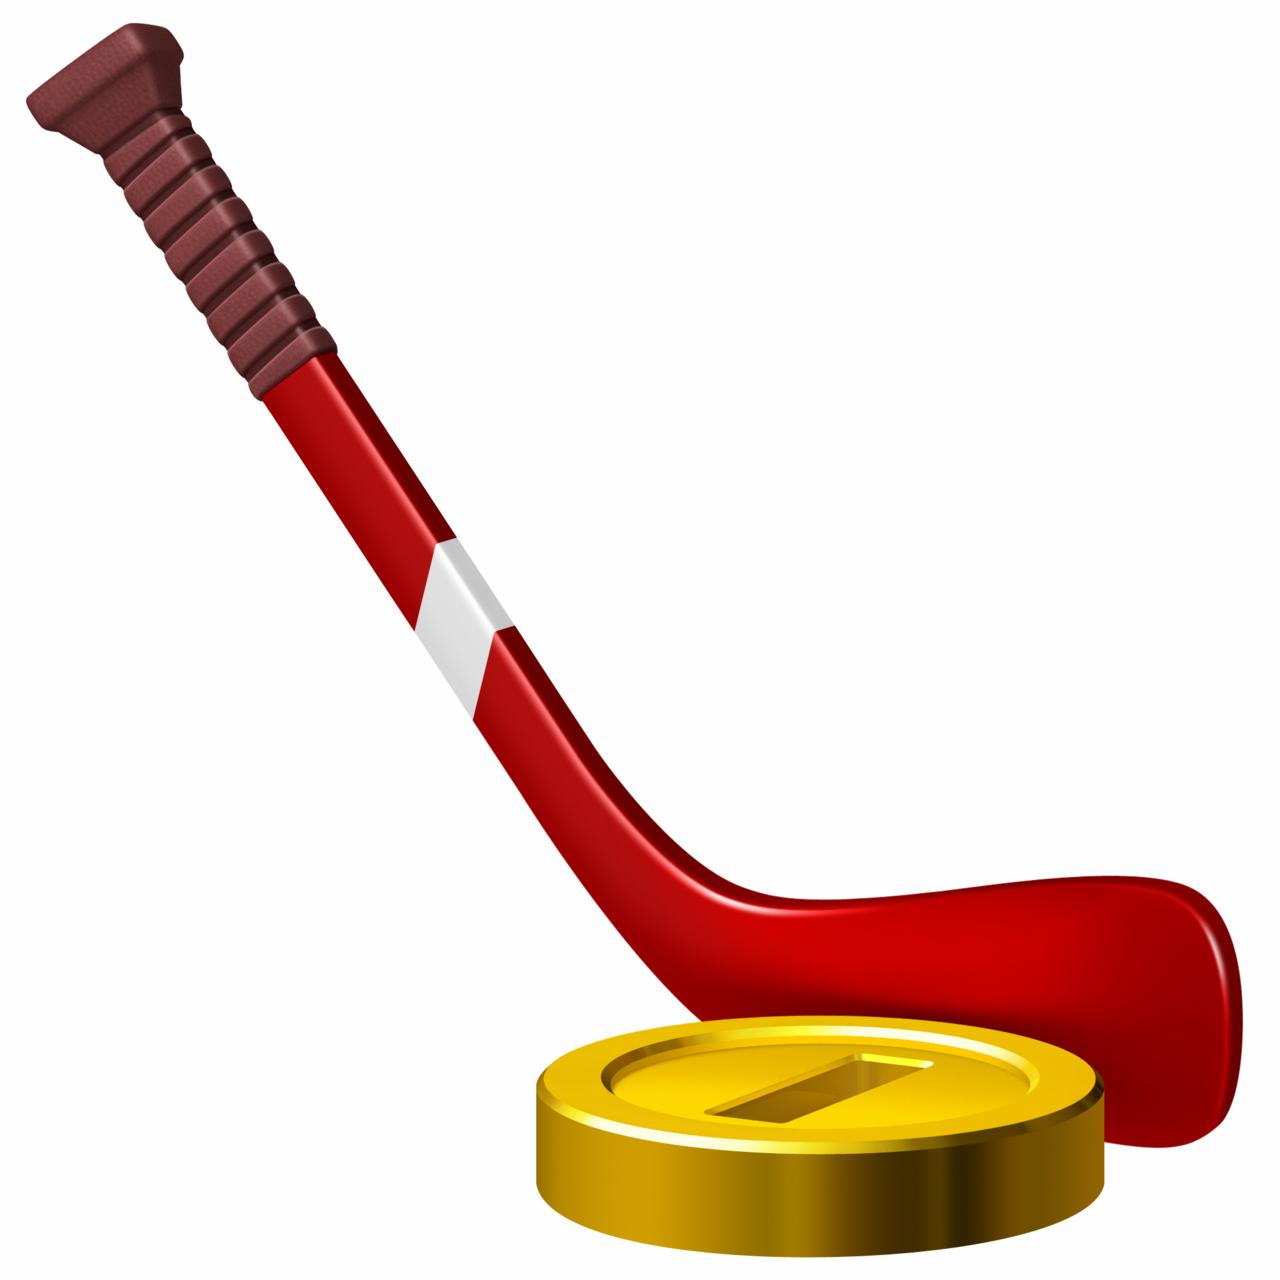 Хоккей клюшка PNG